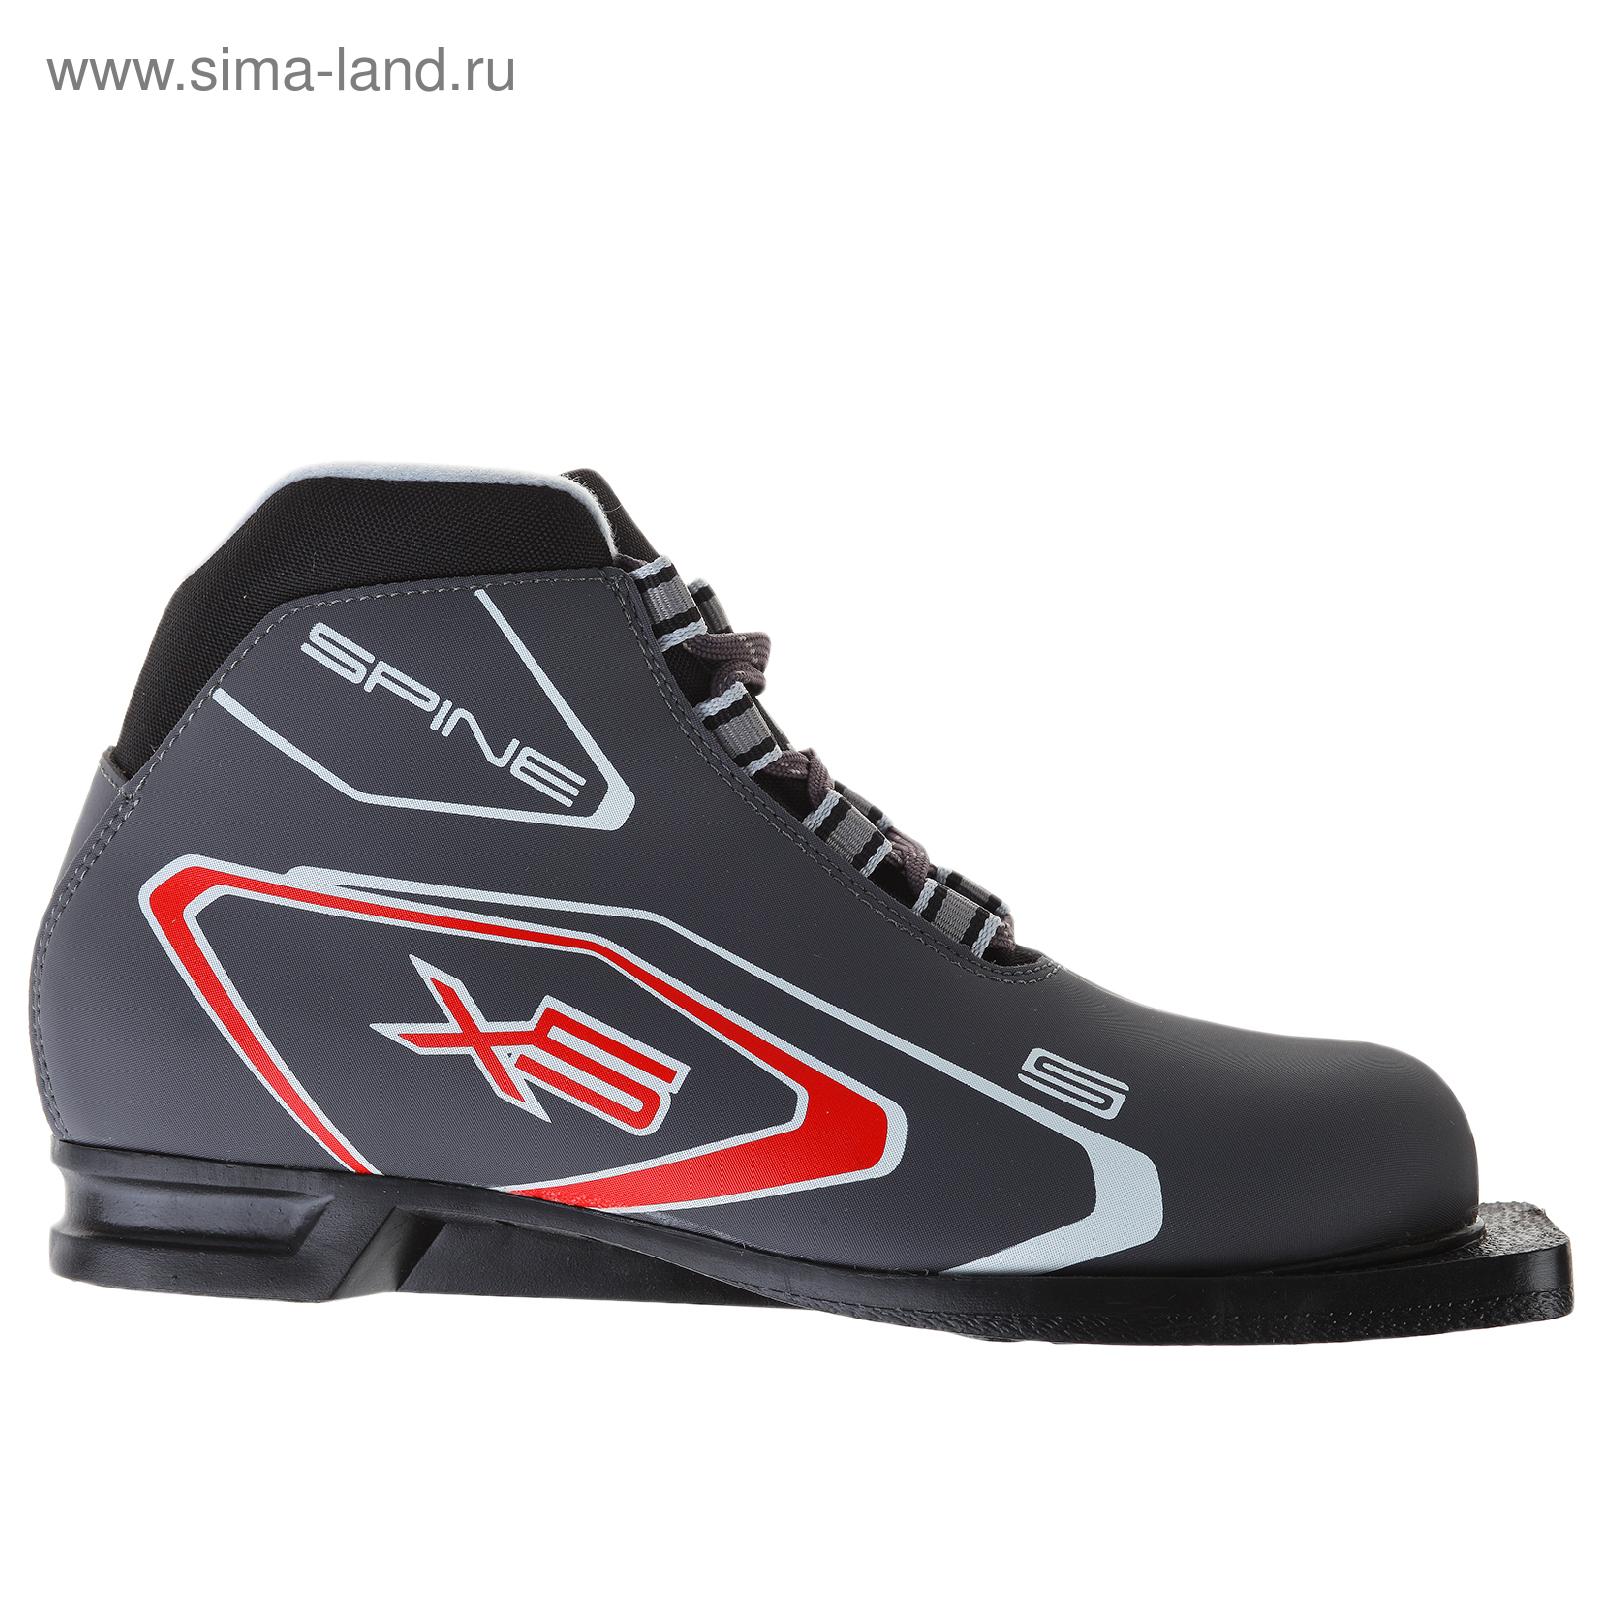 Ботинки SPINE X5 180, крепление NN75, размер 45 (3844164) - Купить ... 3c35fb238aa